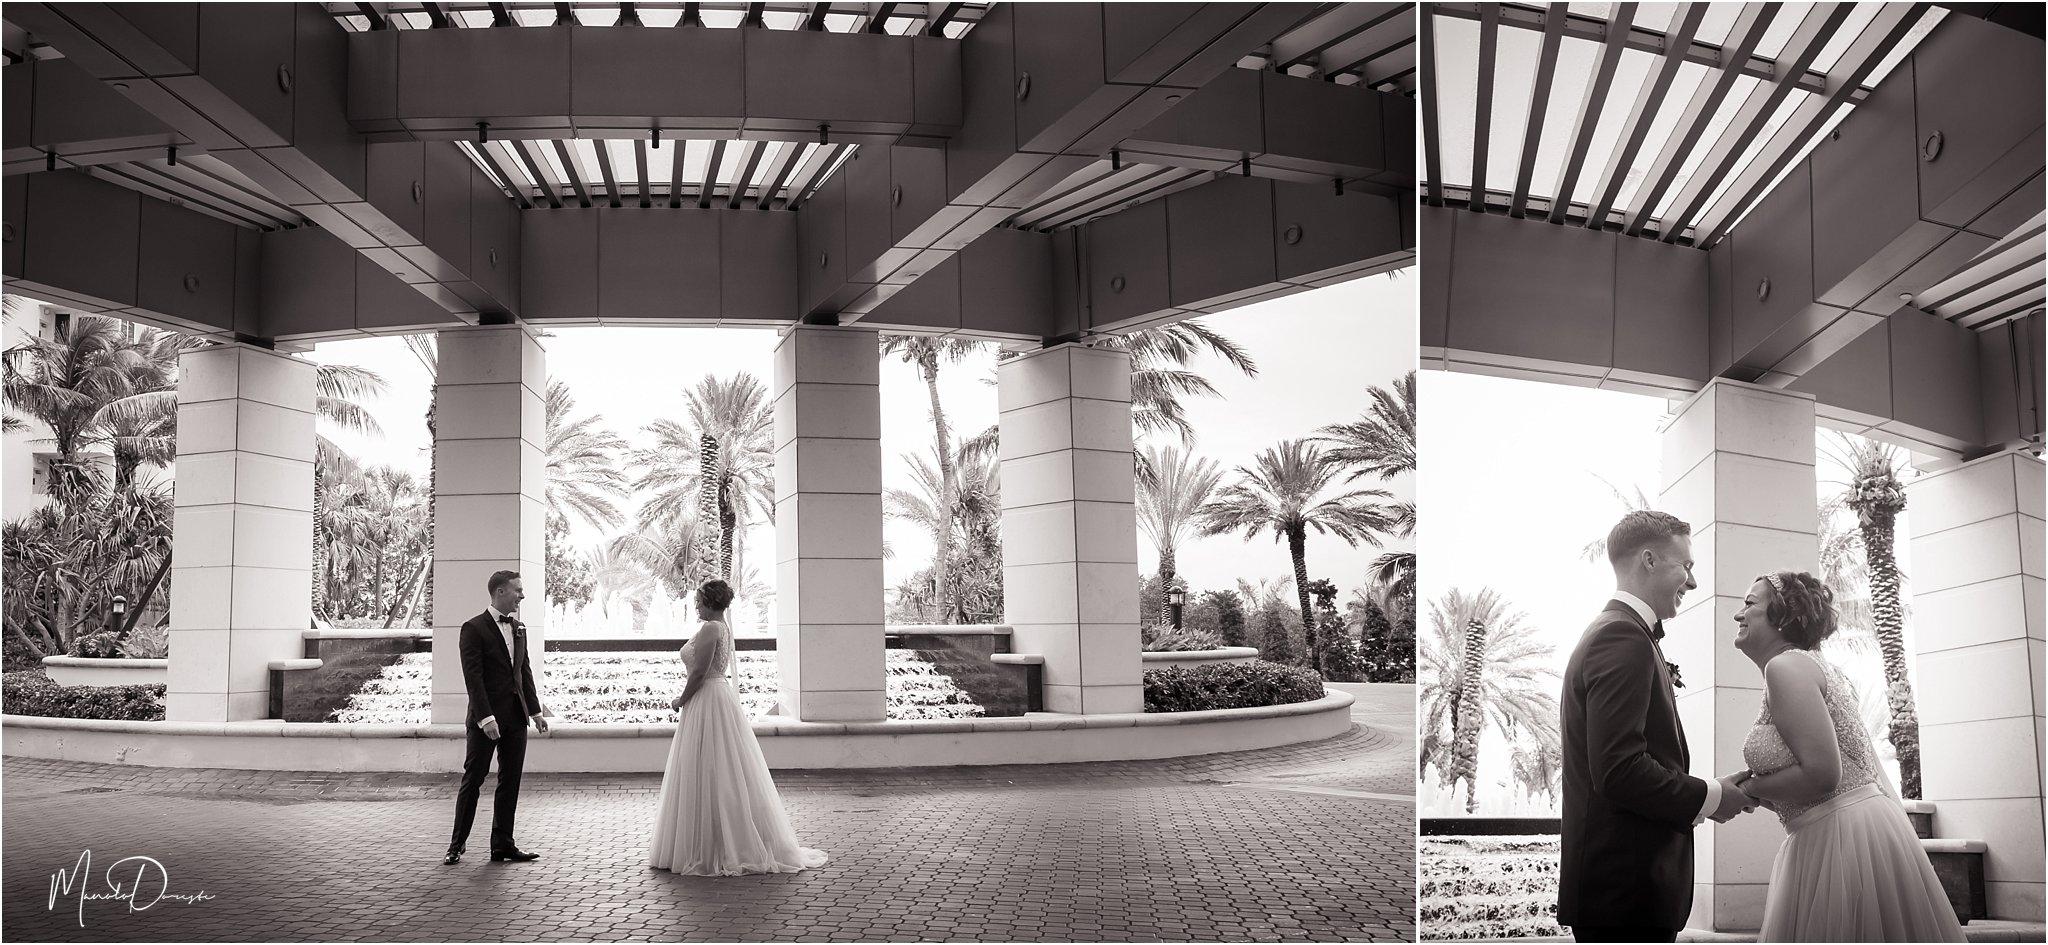 0445_ManoloDoreste_InFocusStudios_Wedding_Family_Photography_Miami_MiamiPhotographer.jpg